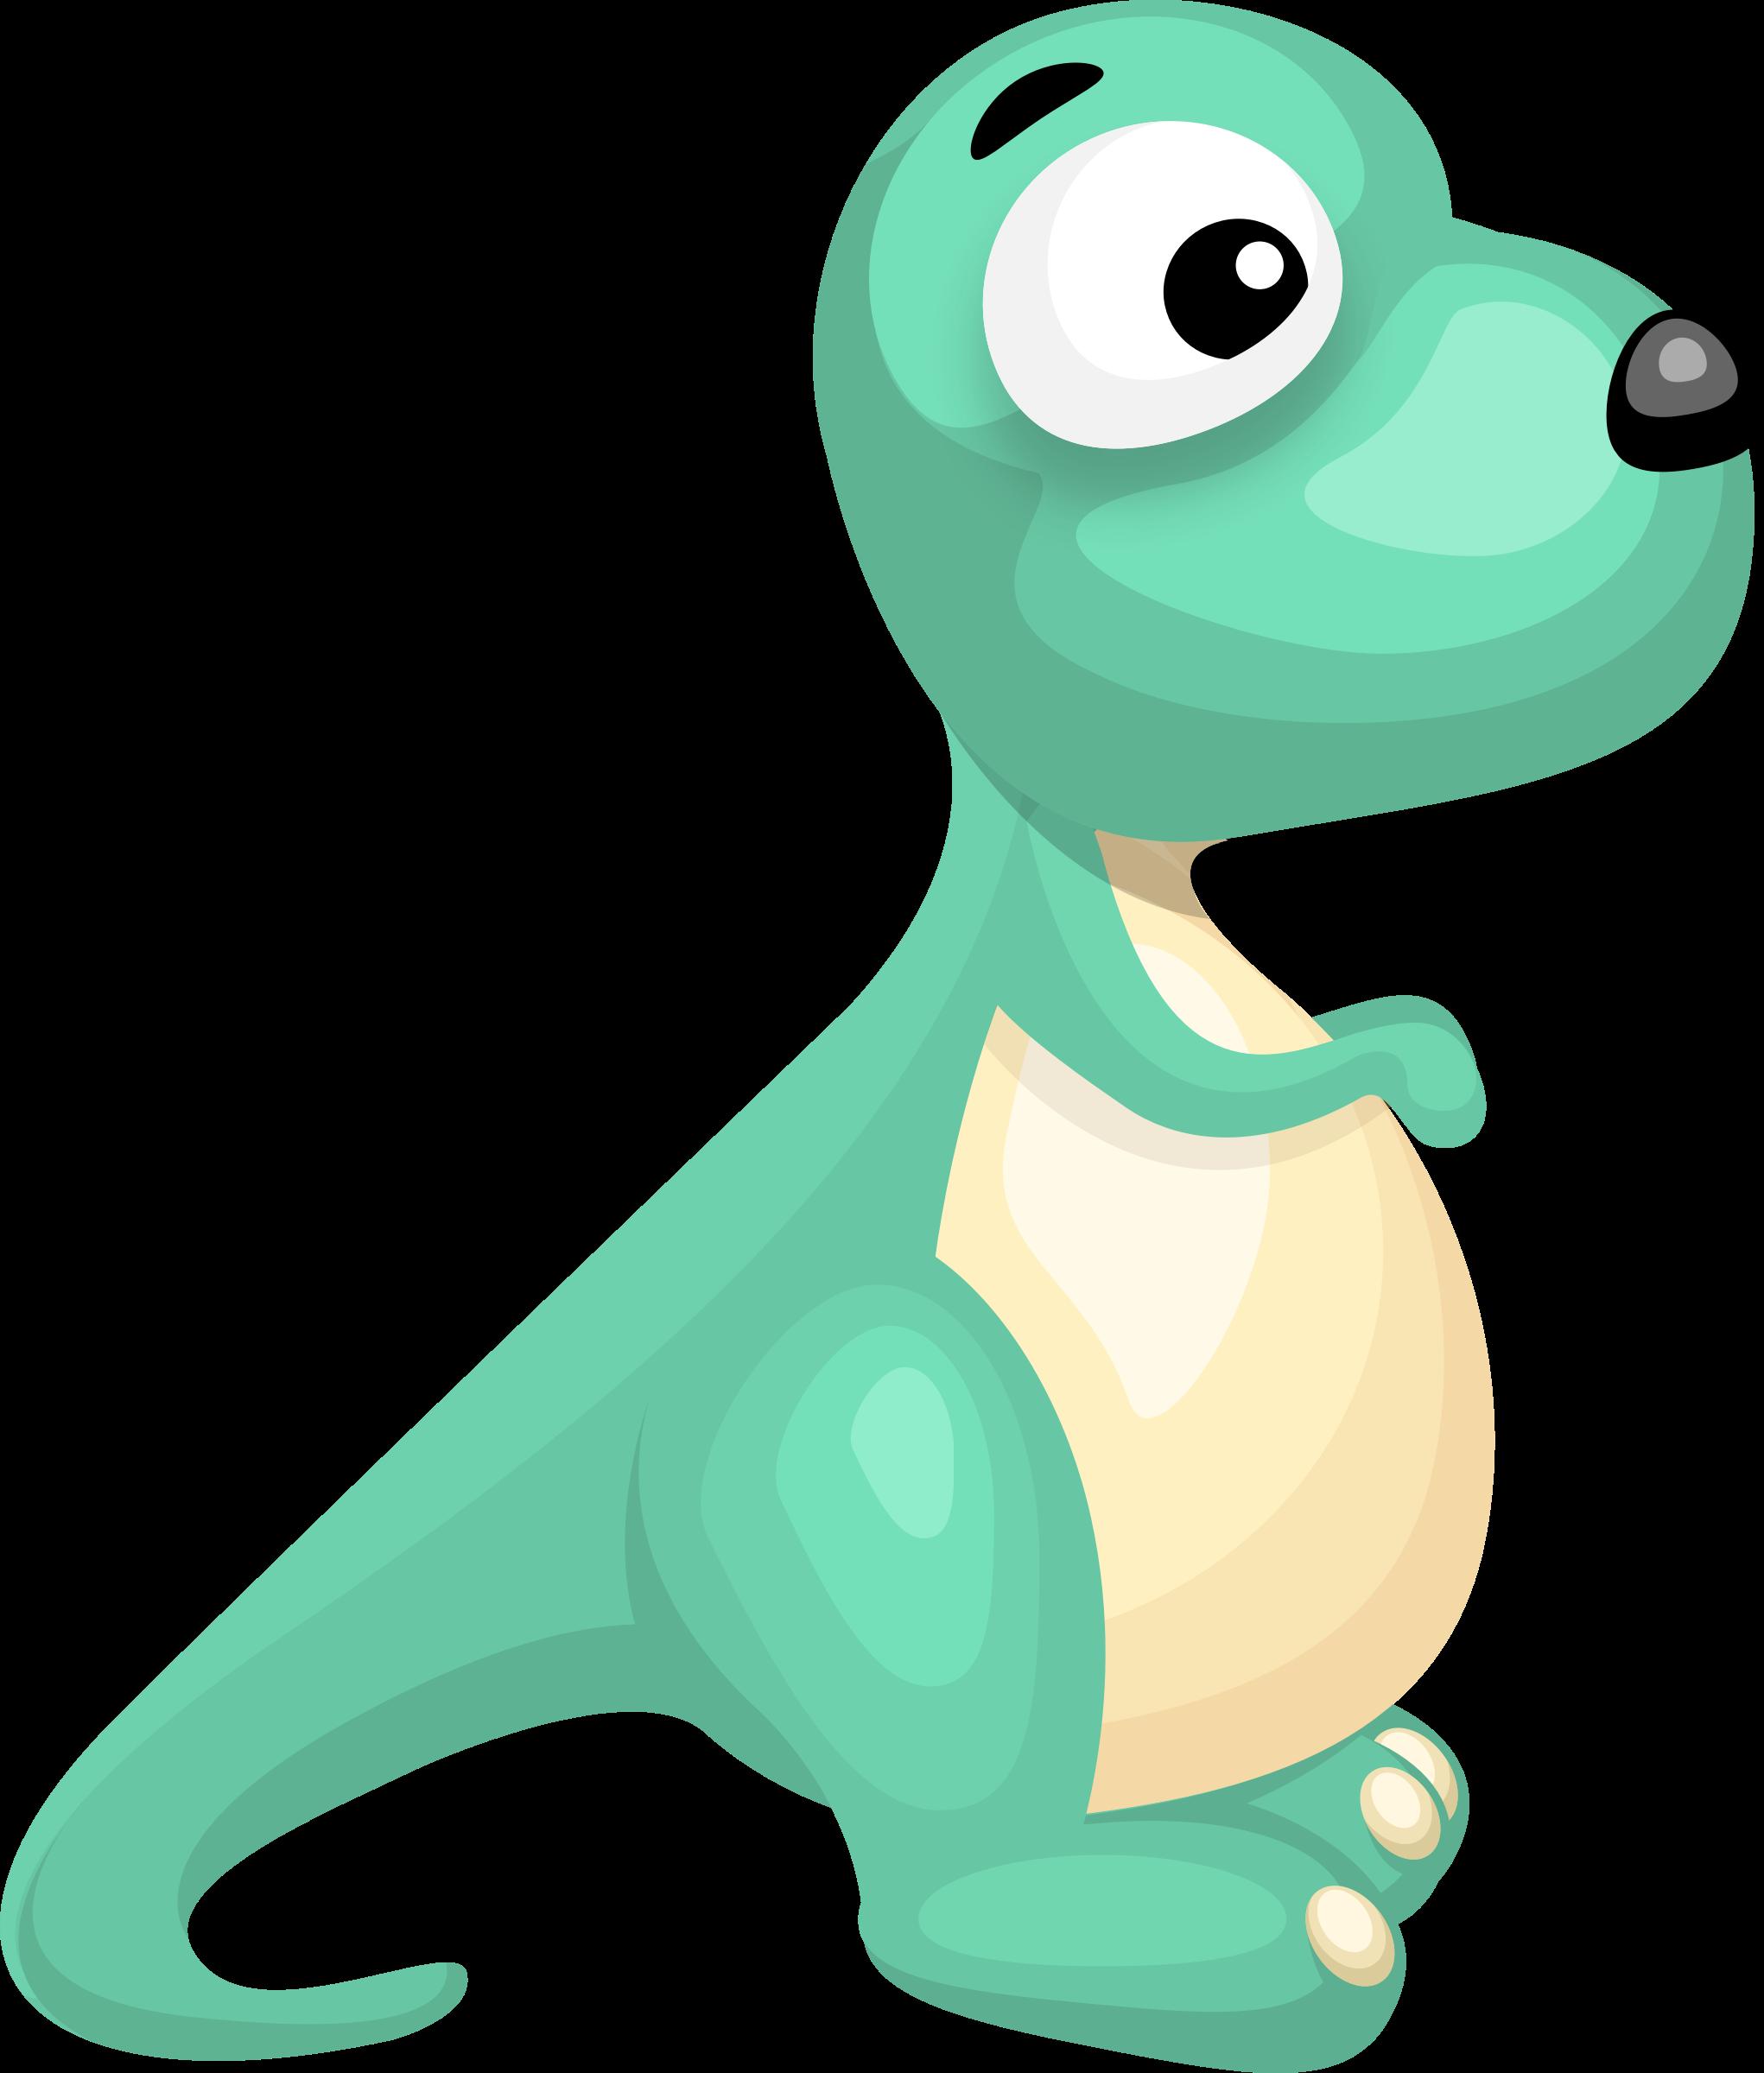 Dinosaurs clipart vector. Reading dinosaur uxayl bclipart